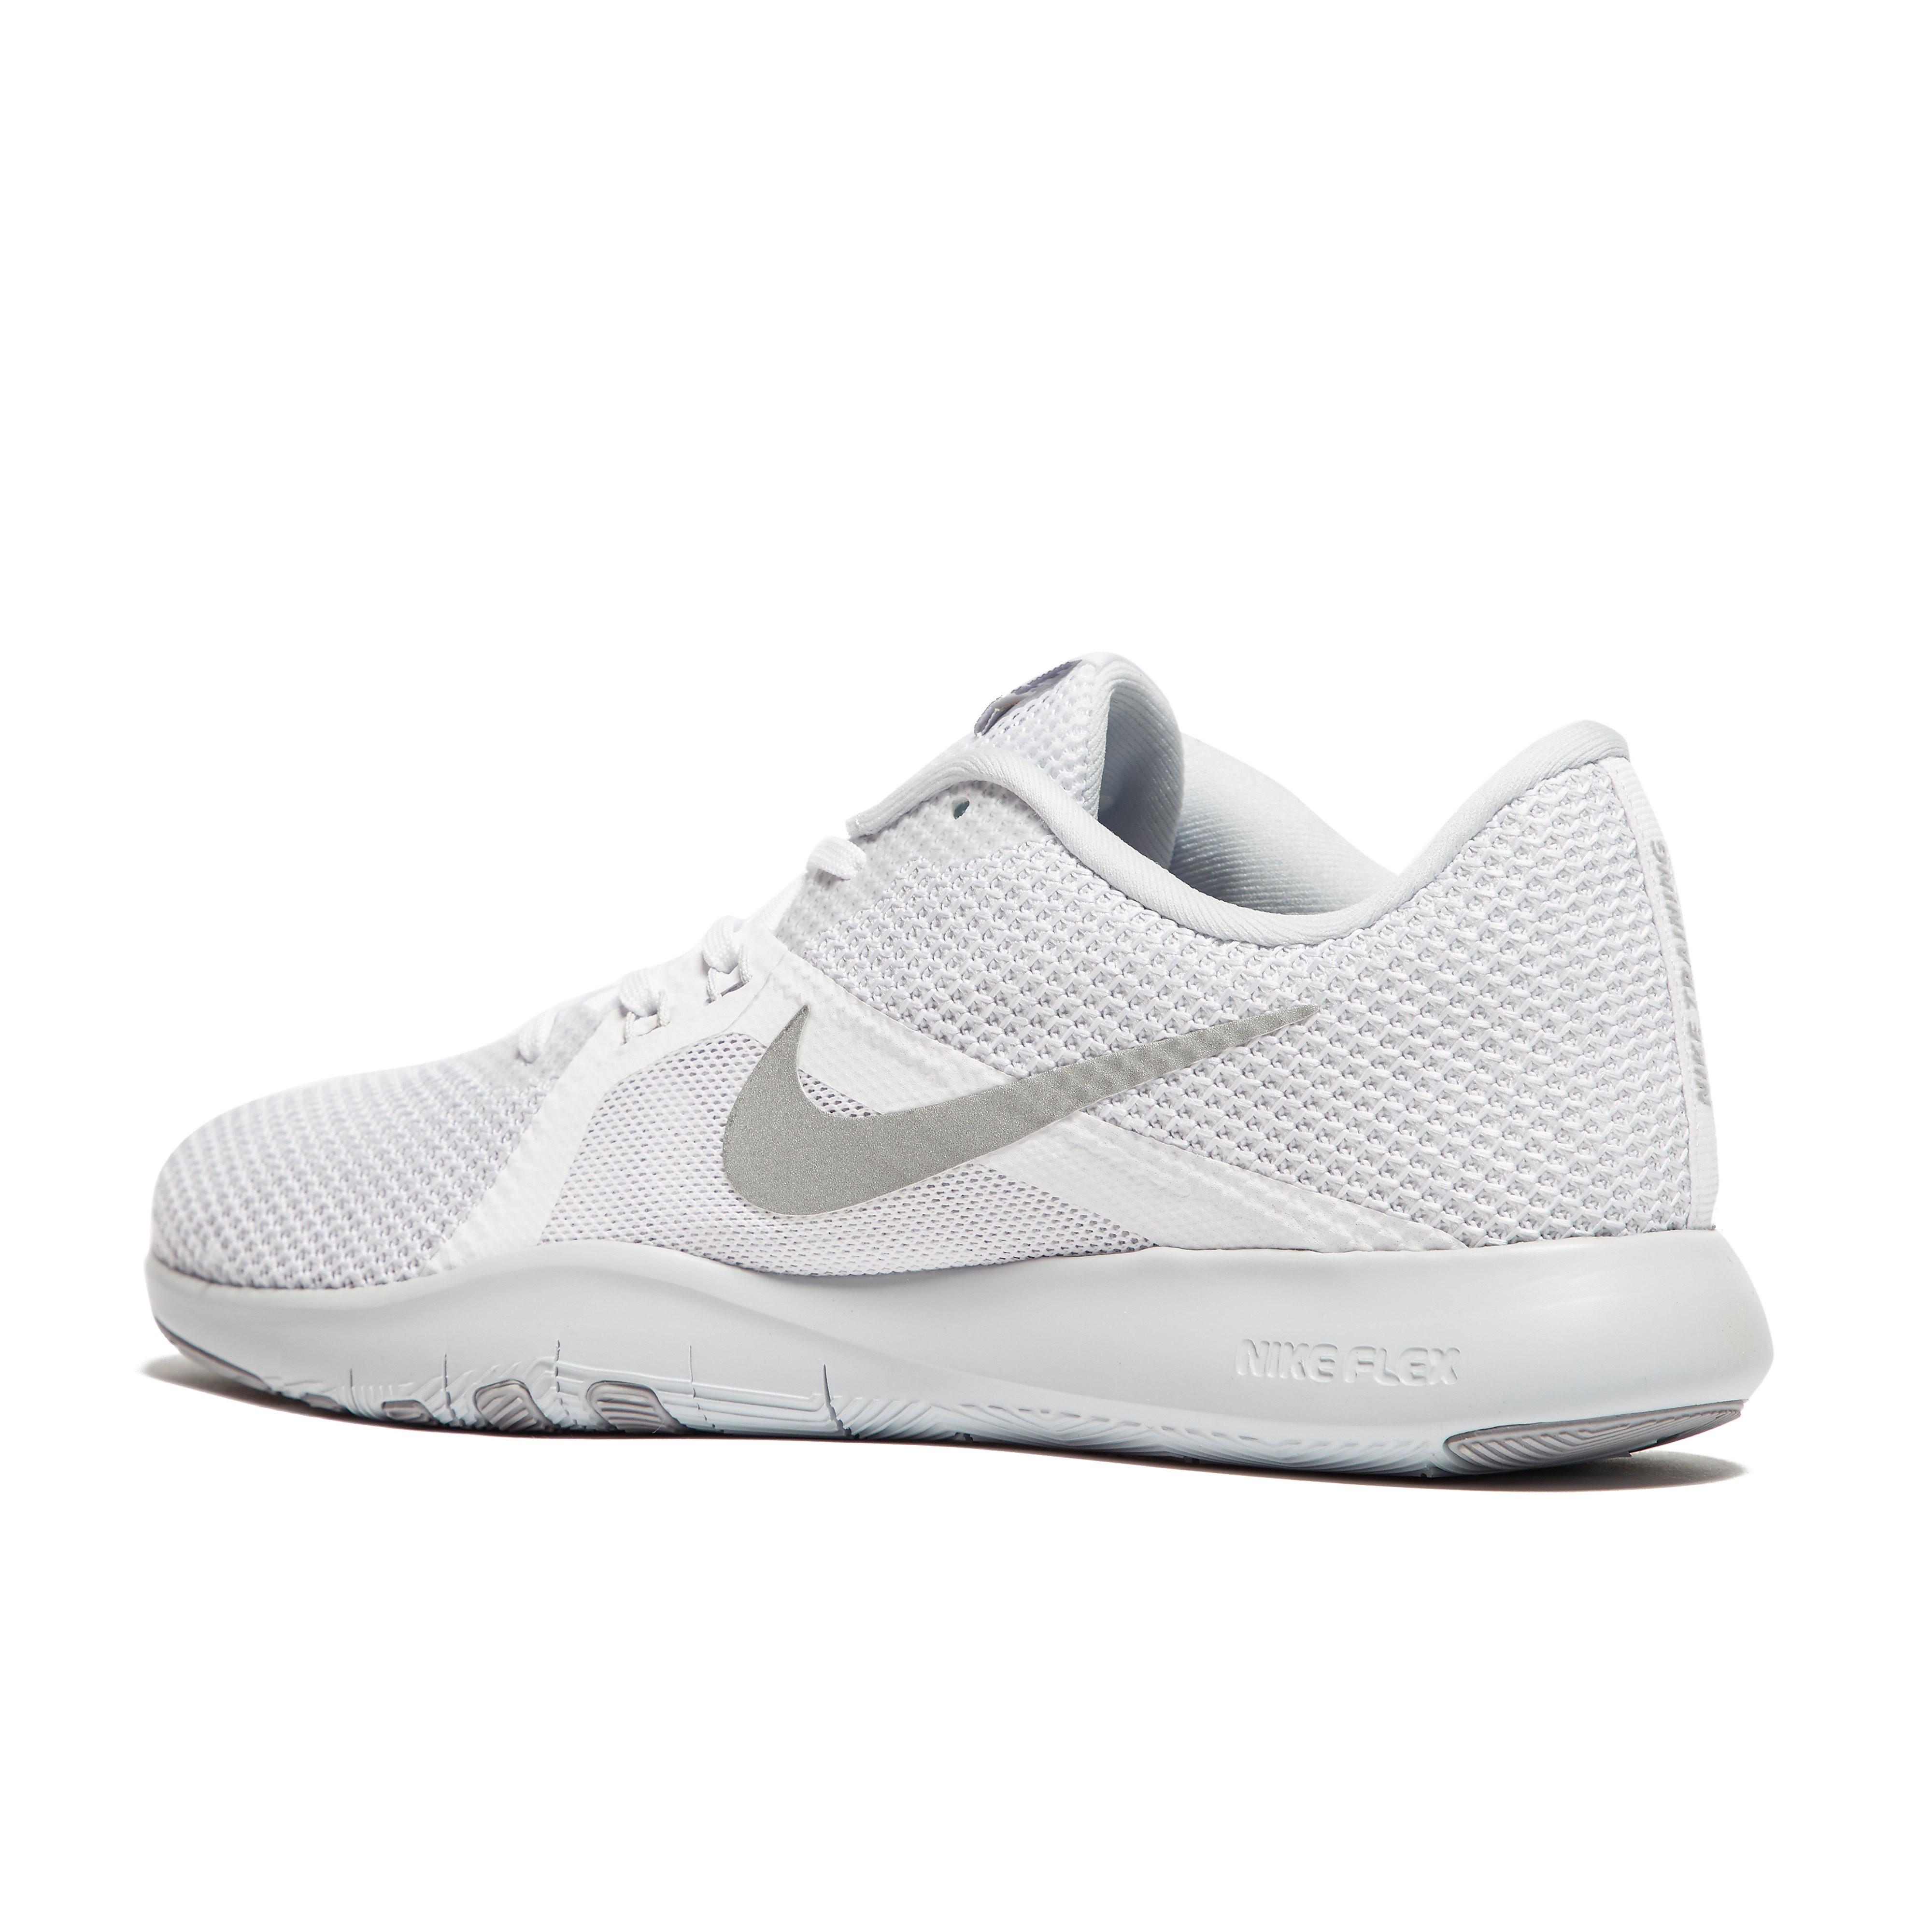 Nike Flex Trainer 8 Women's Training Shoes